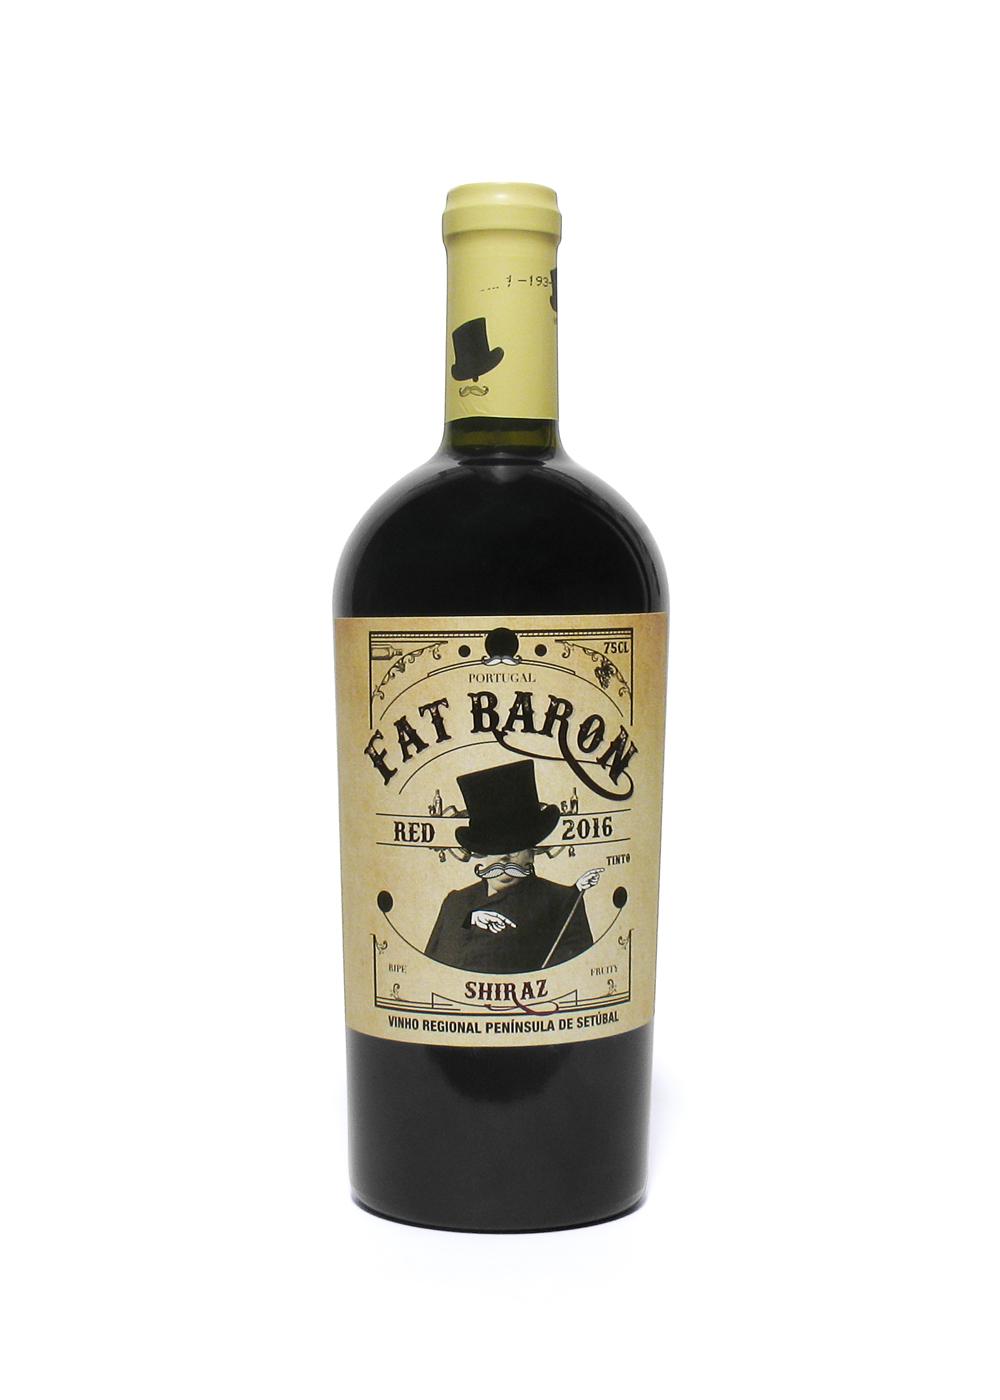 Fat Baron